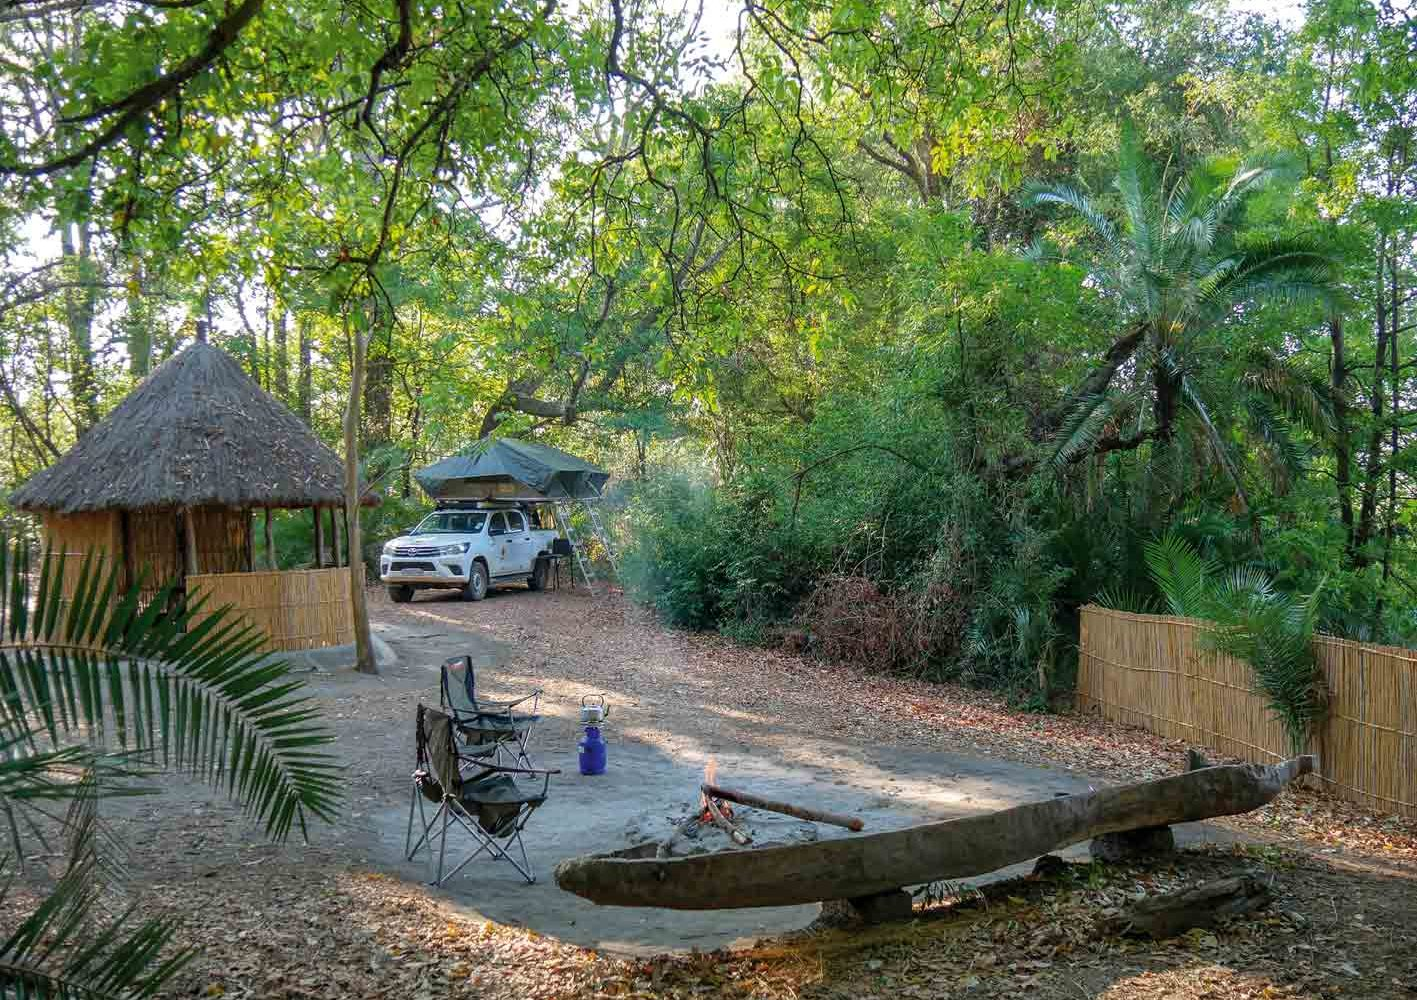 Camping-Leben während der 4x4-Selbstfahrer-Safari in Zambia